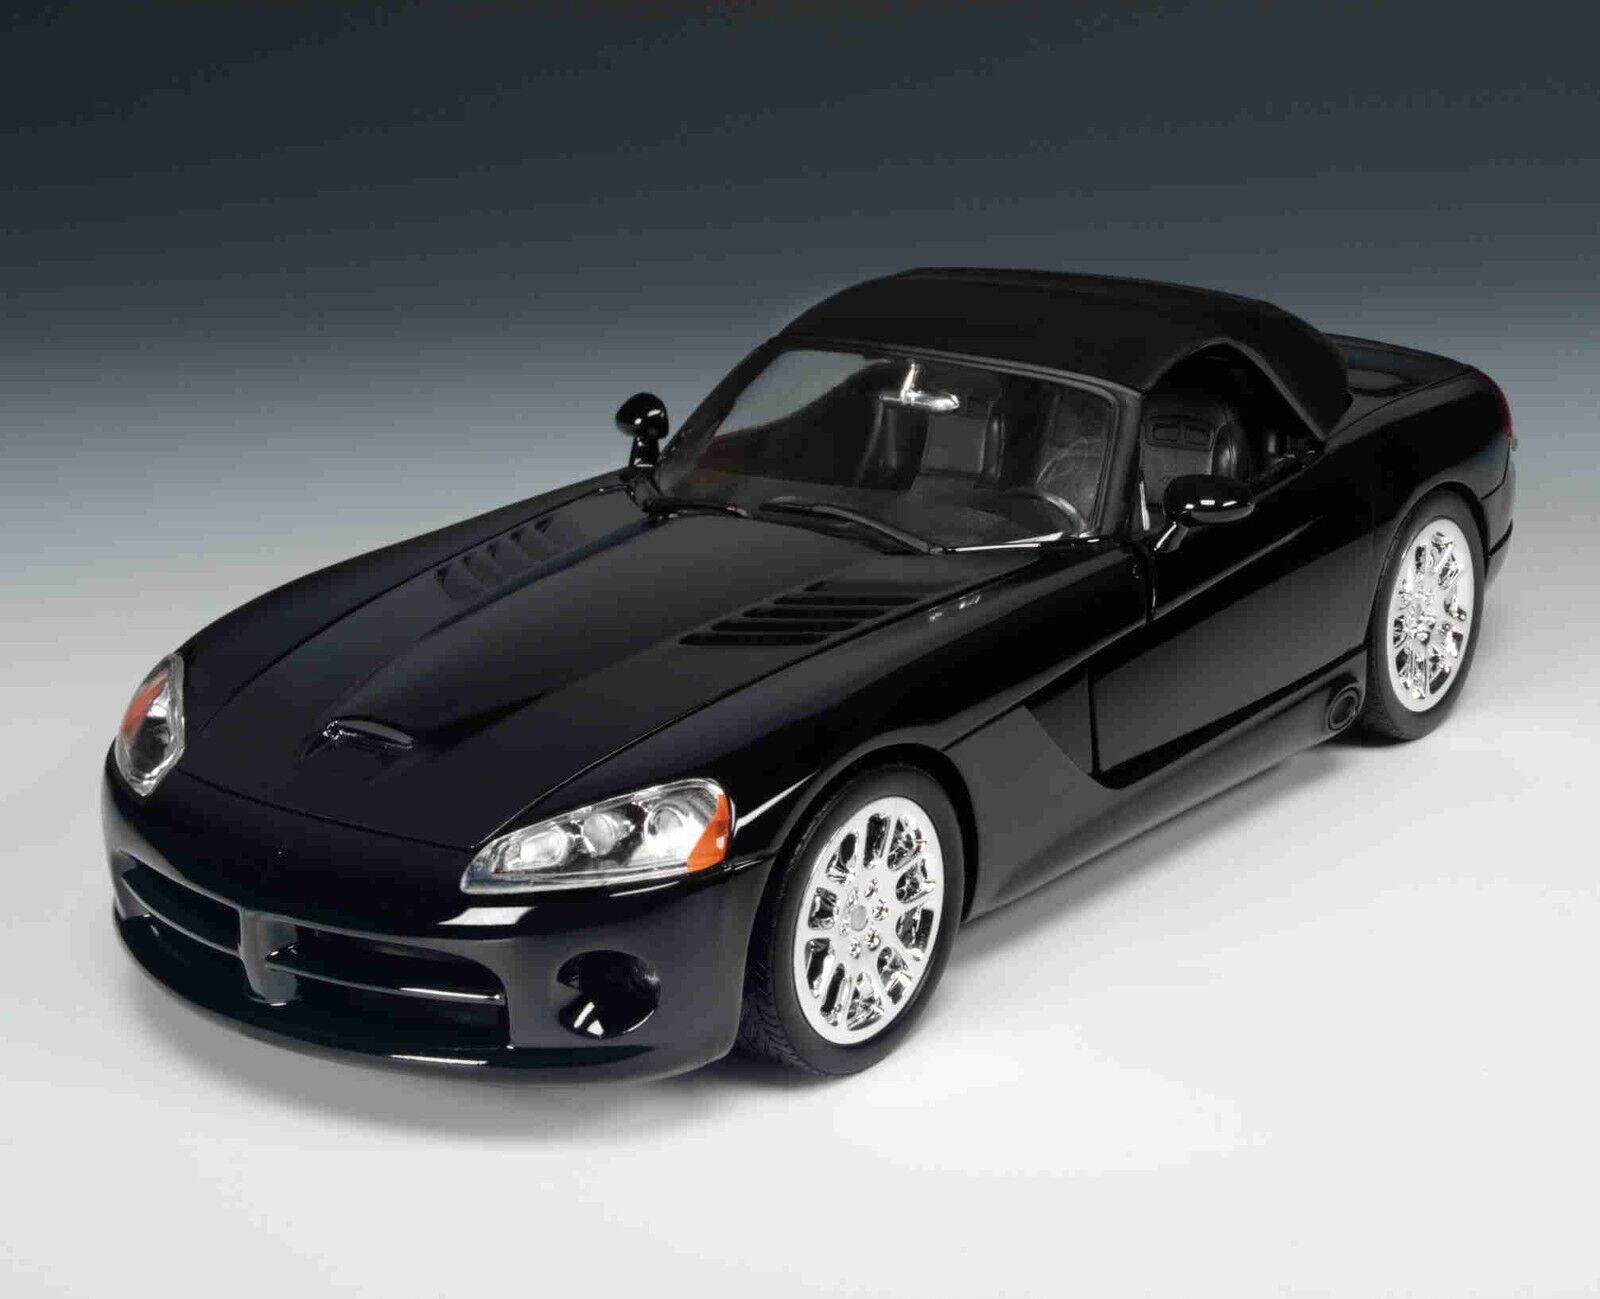 2003 Dodge Viper Srt 10 nero 1 18 Ertl American Muscle 33249